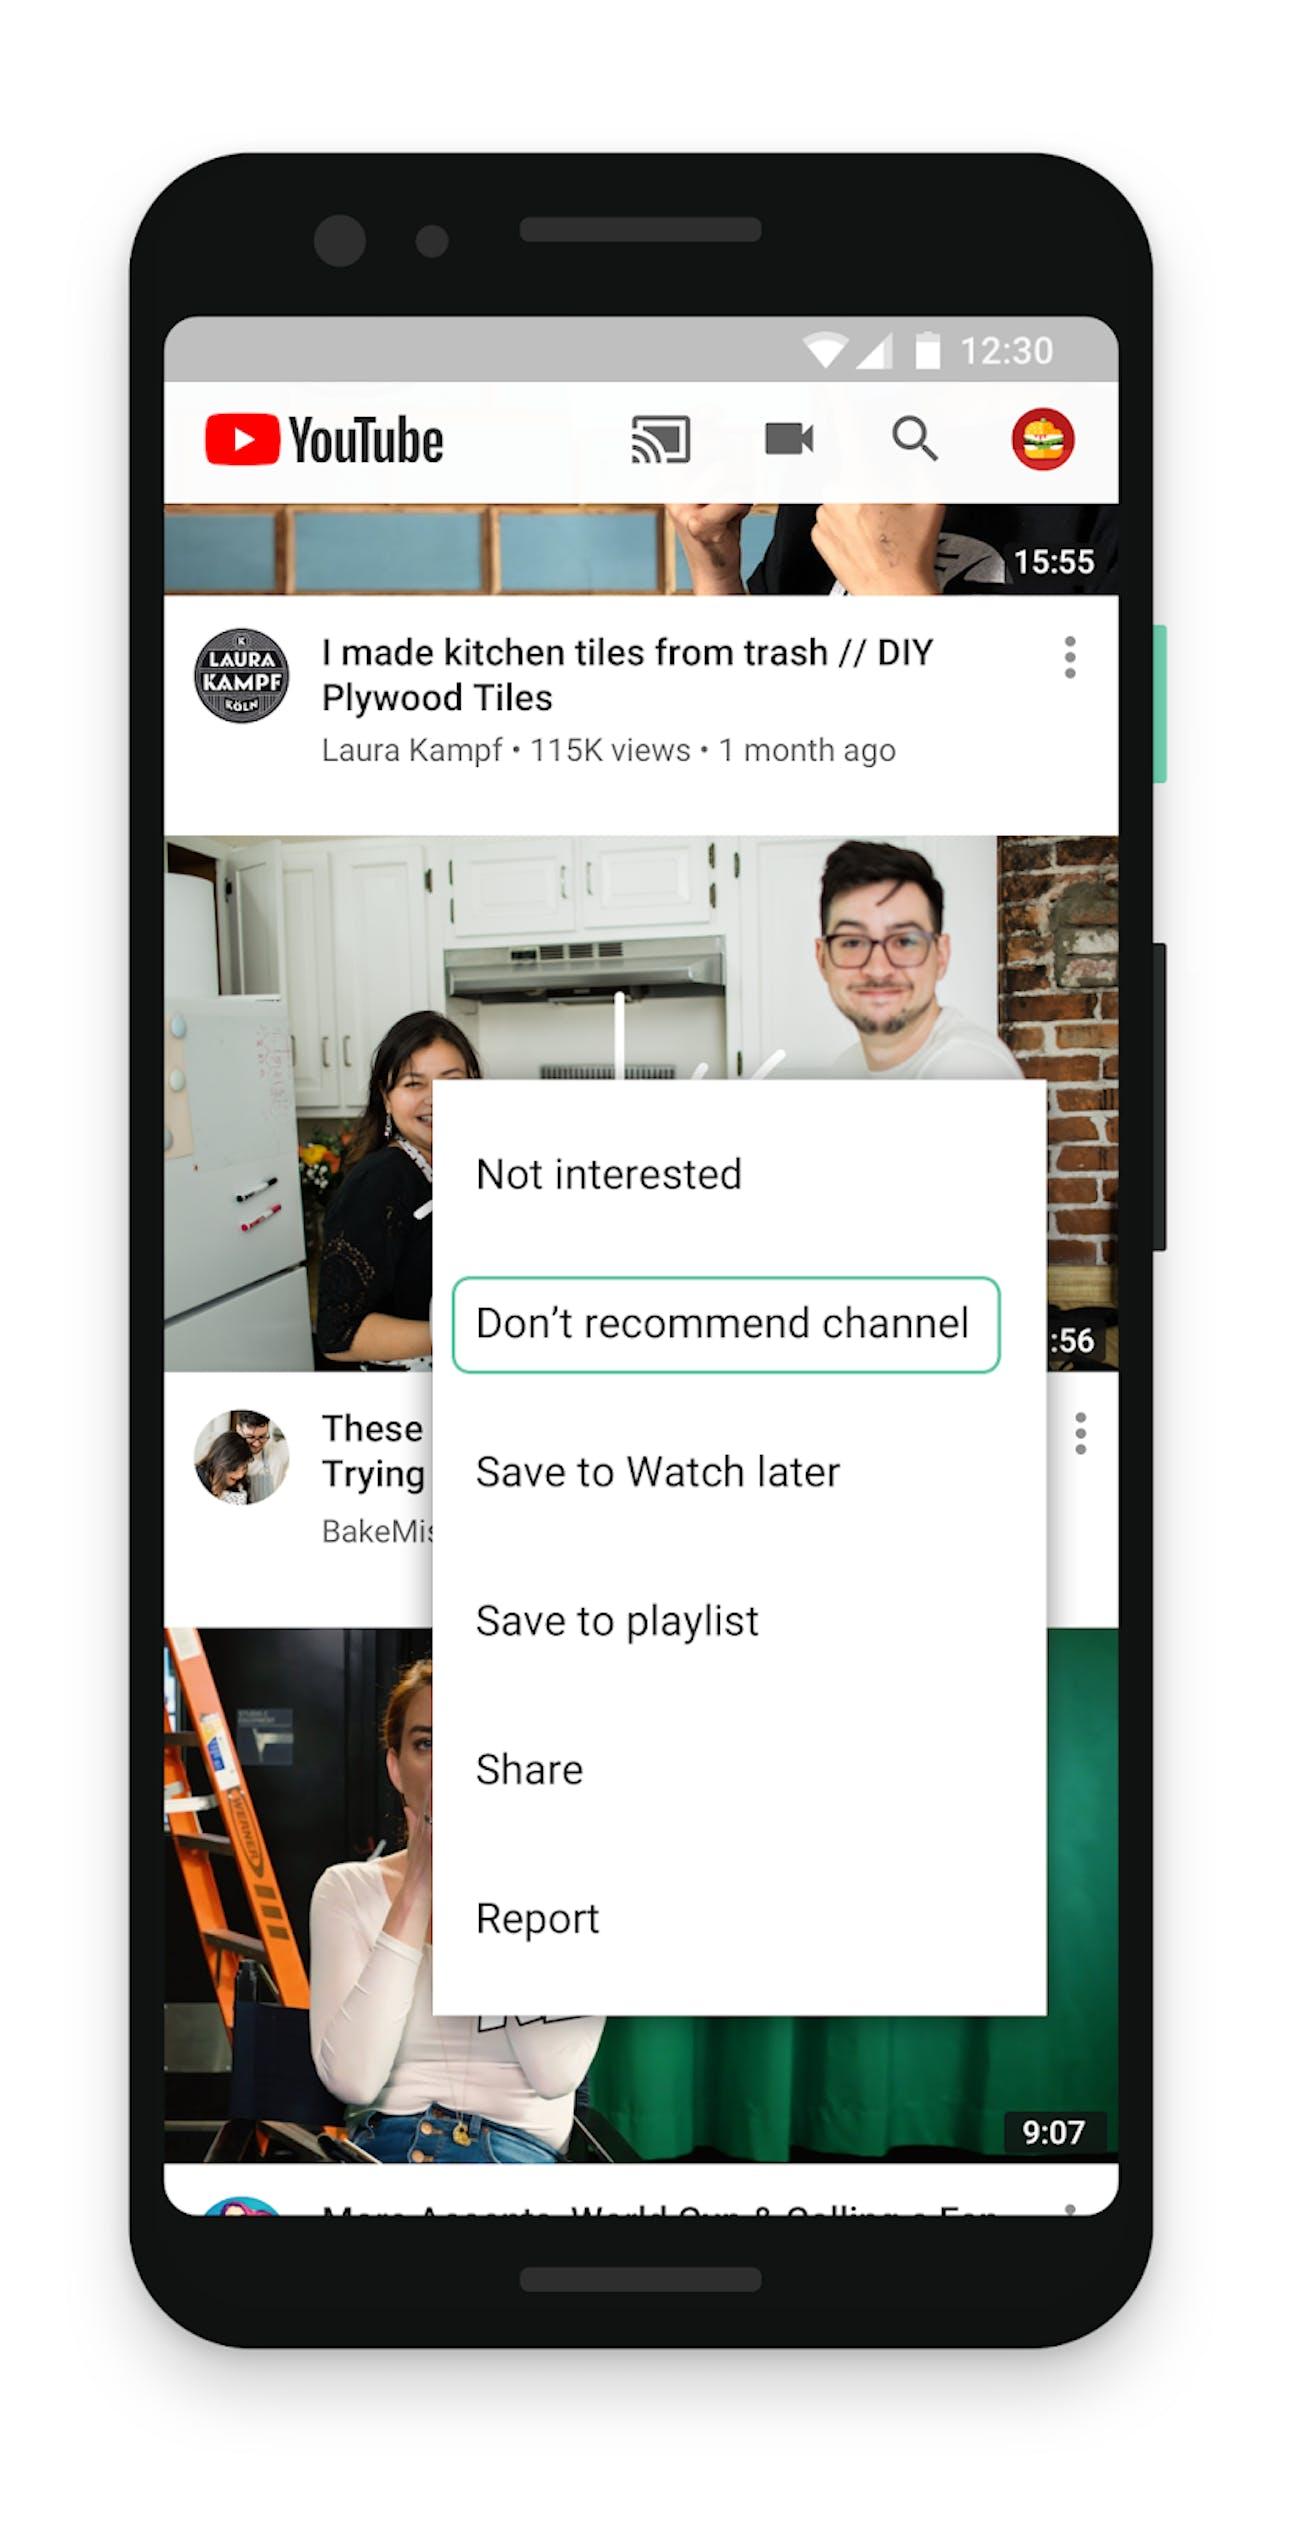 Youtube controls